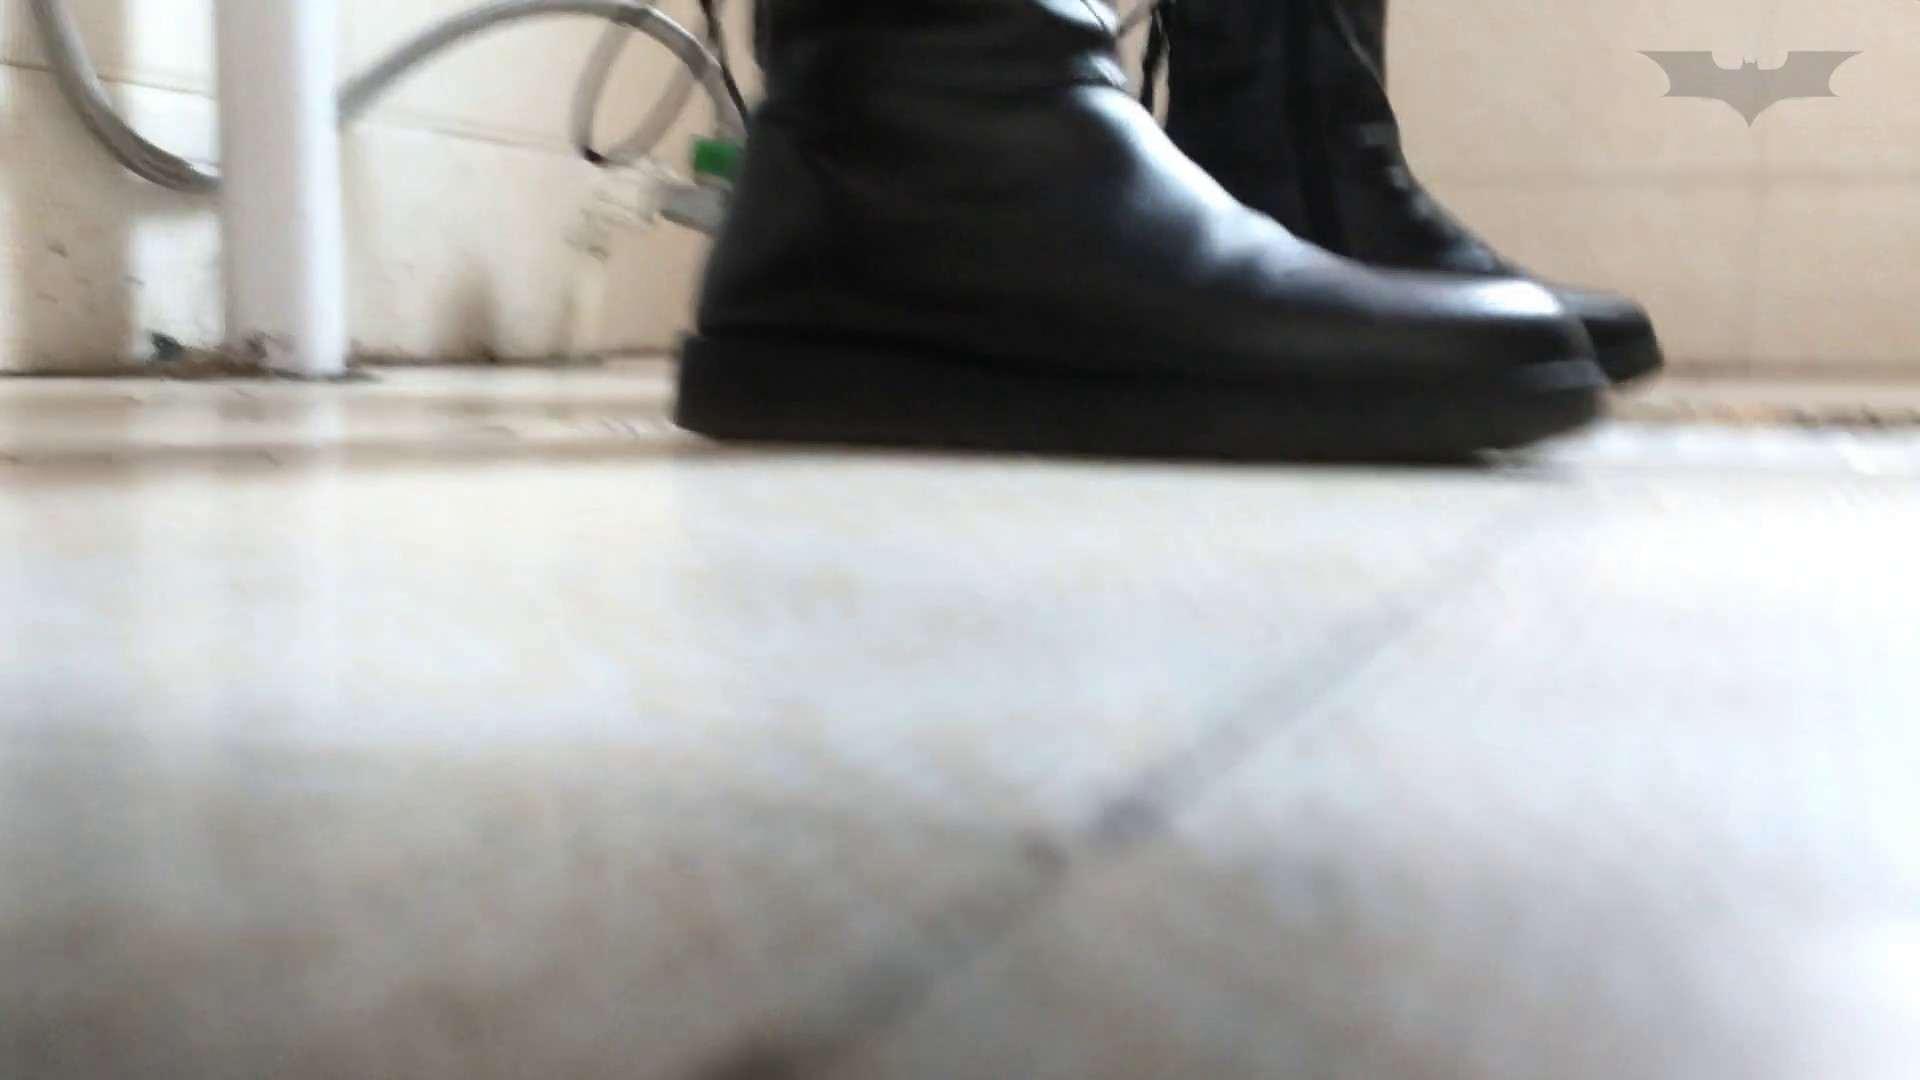 芸術大学ガチ潜入盗撮 JD盗撮 美女の洗面所の秘密 Vol.109 潜入 エロ画像 103画像 22